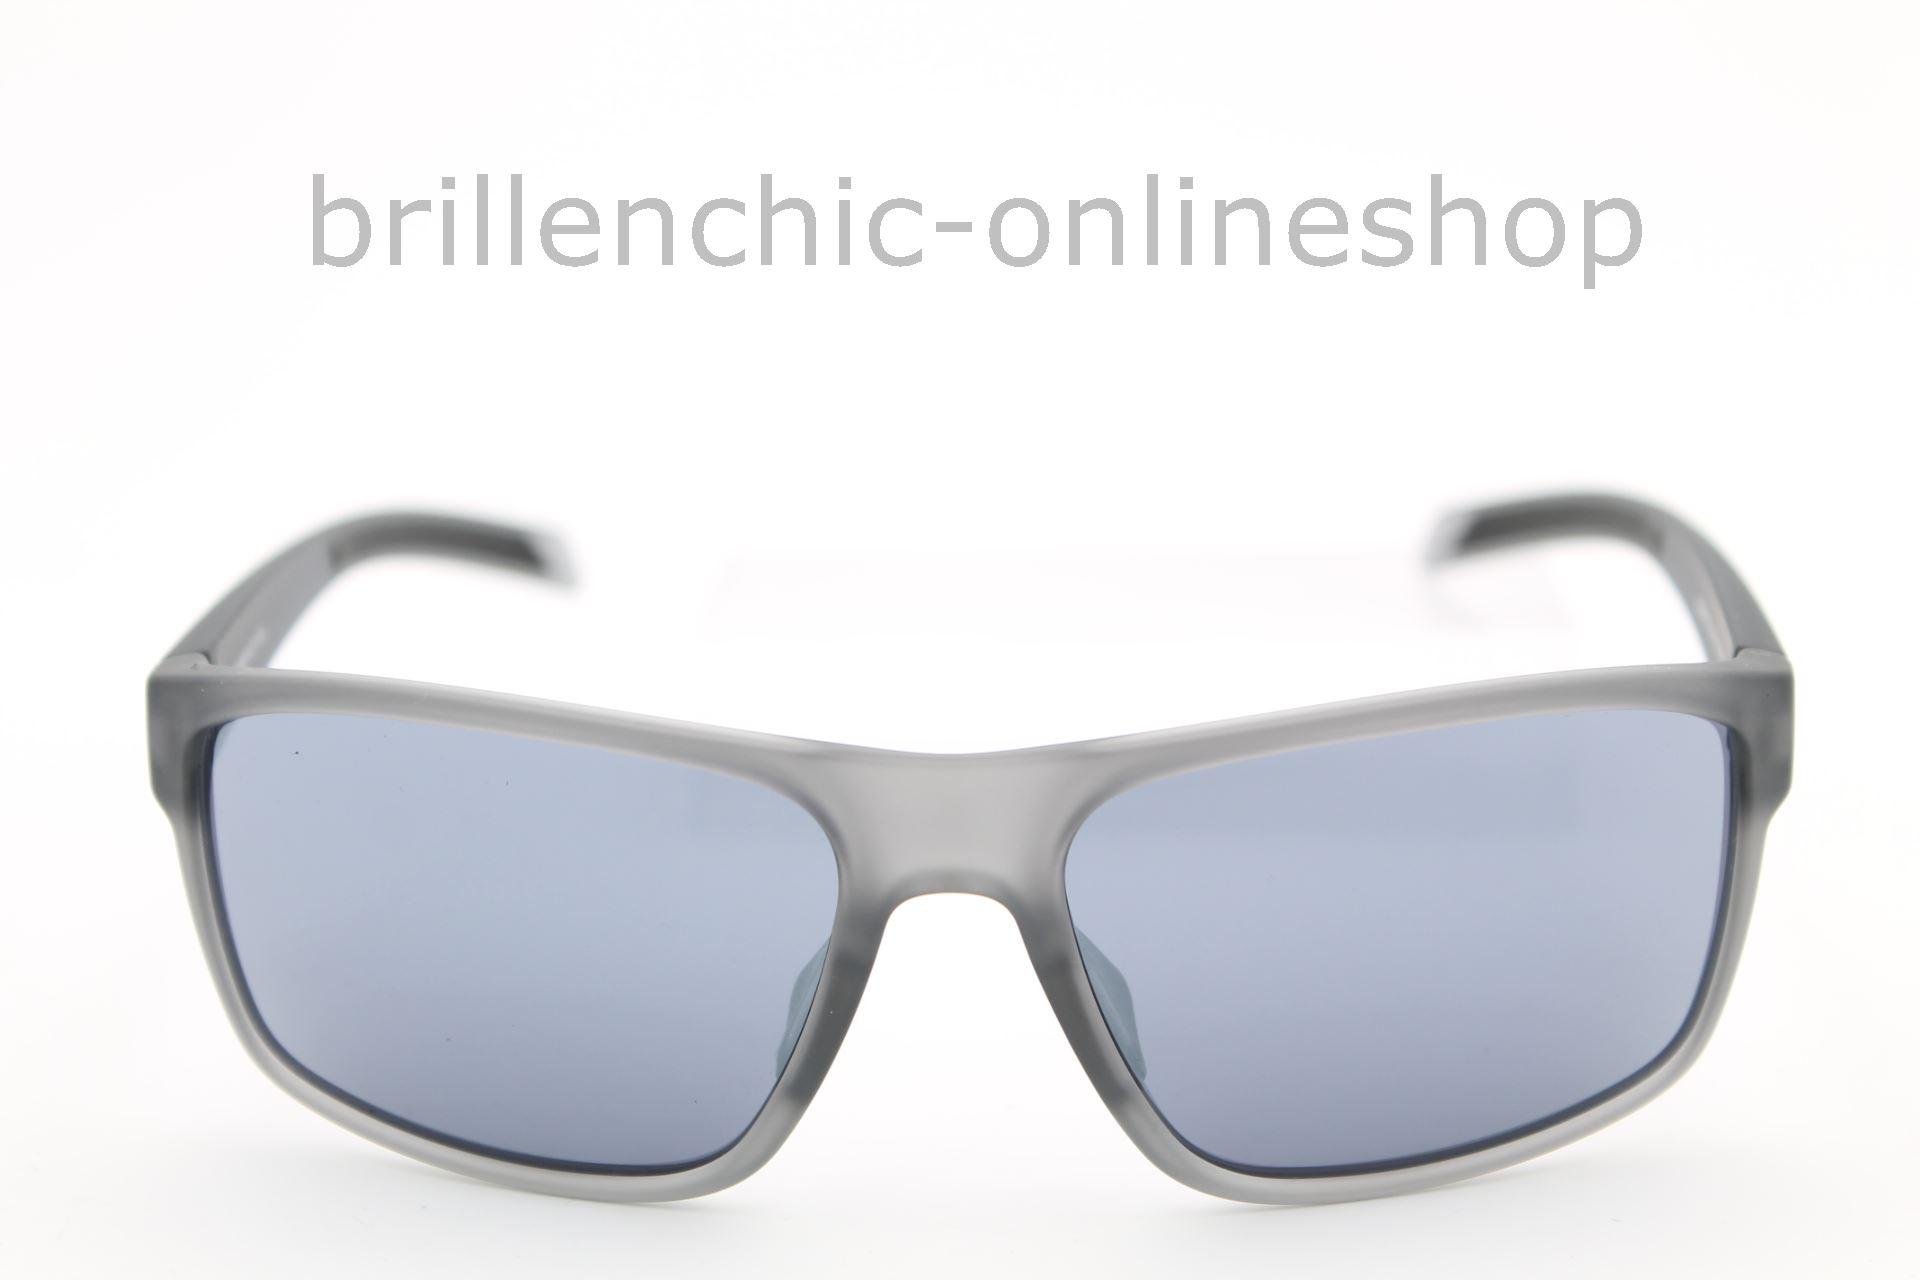 53b51cf7fc Brillenchic-onlineshop in Berlin - ADIDAS Whipstart a423 6152